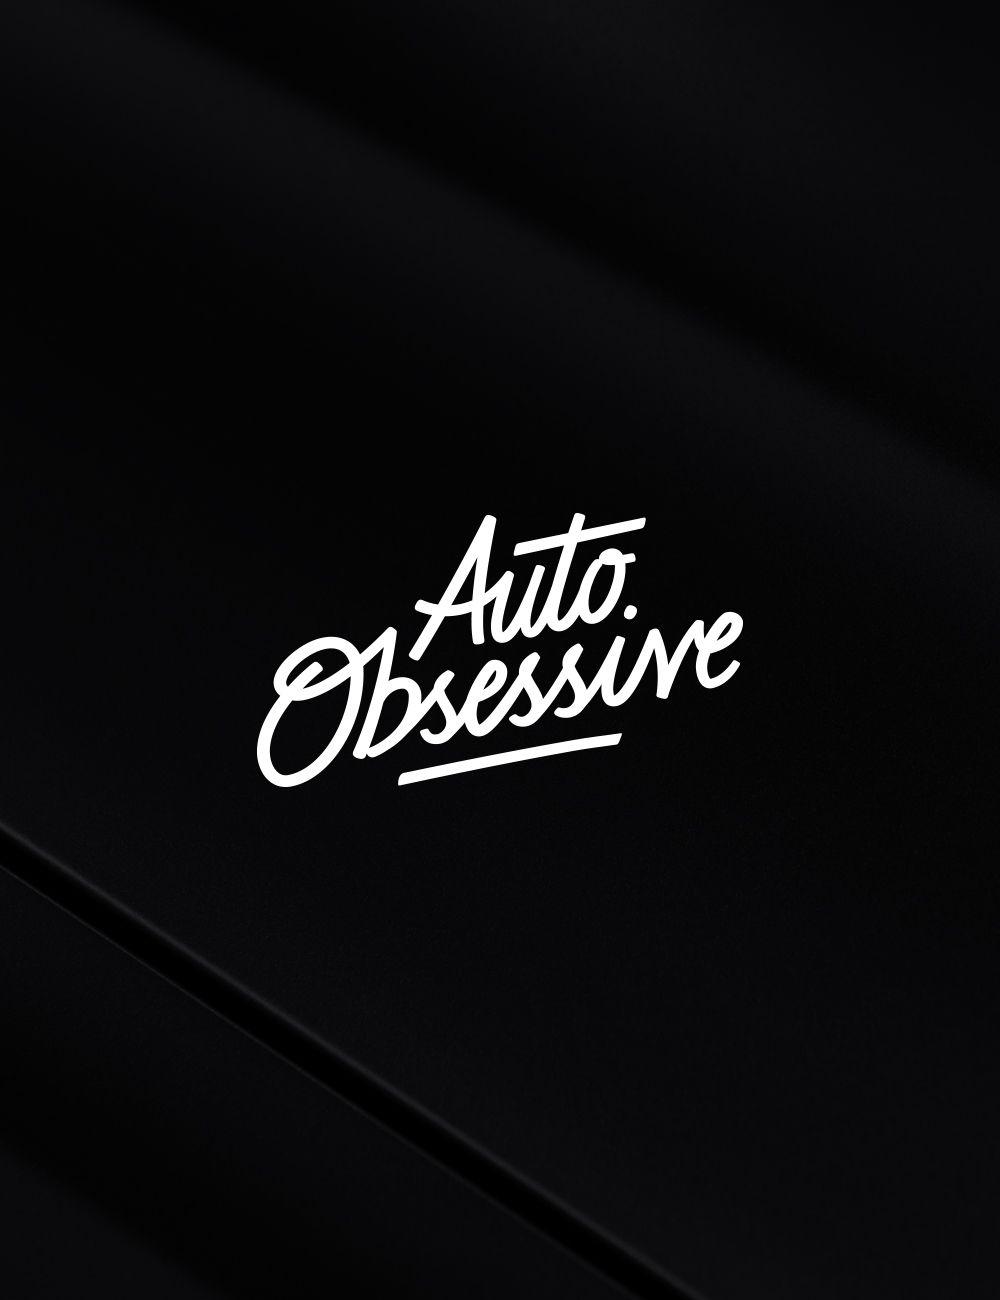 Logo Design Auto Obsessive Car Logo Design Logos Logo Design [ 1300 x 1000 Pixel ]